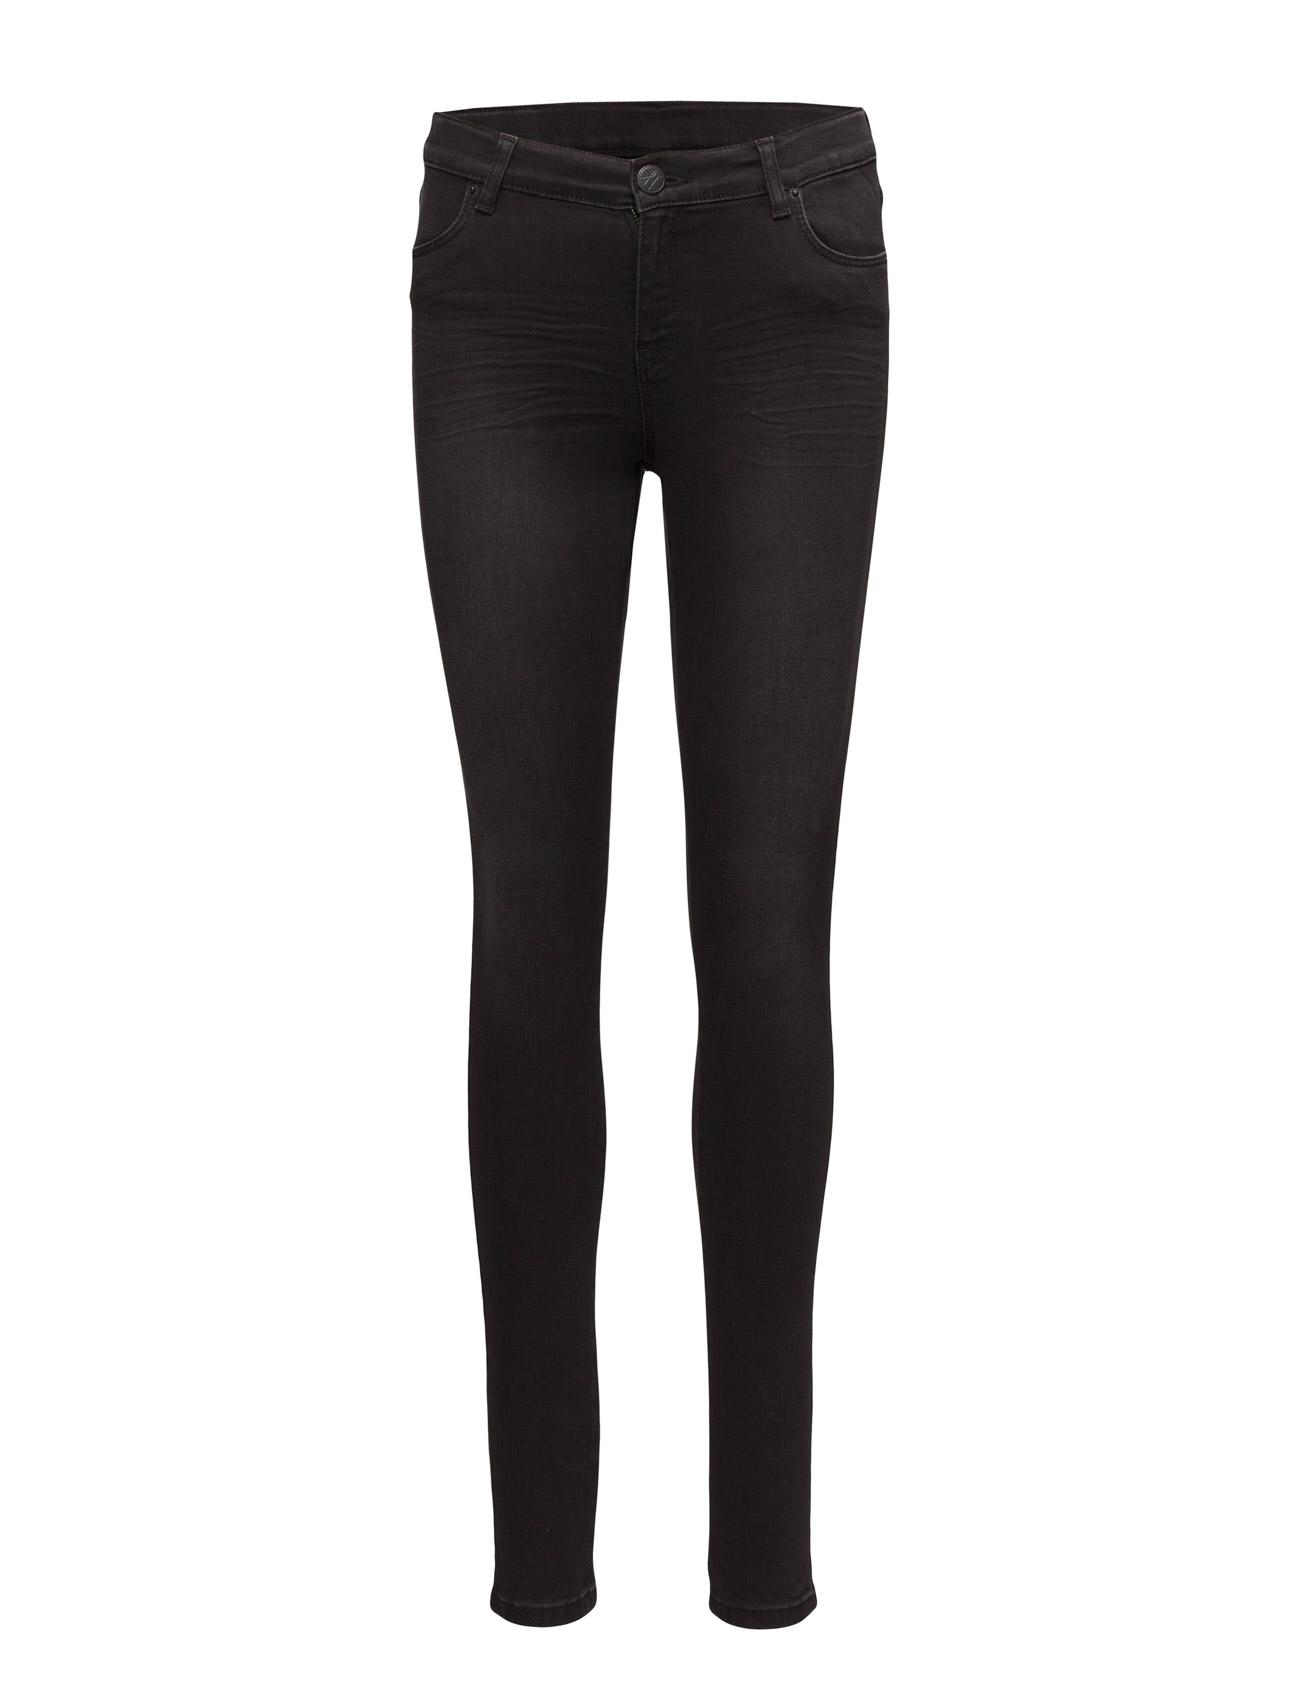 Nicole 004 black venice, jeans fra 2nd one på boozt.com dk